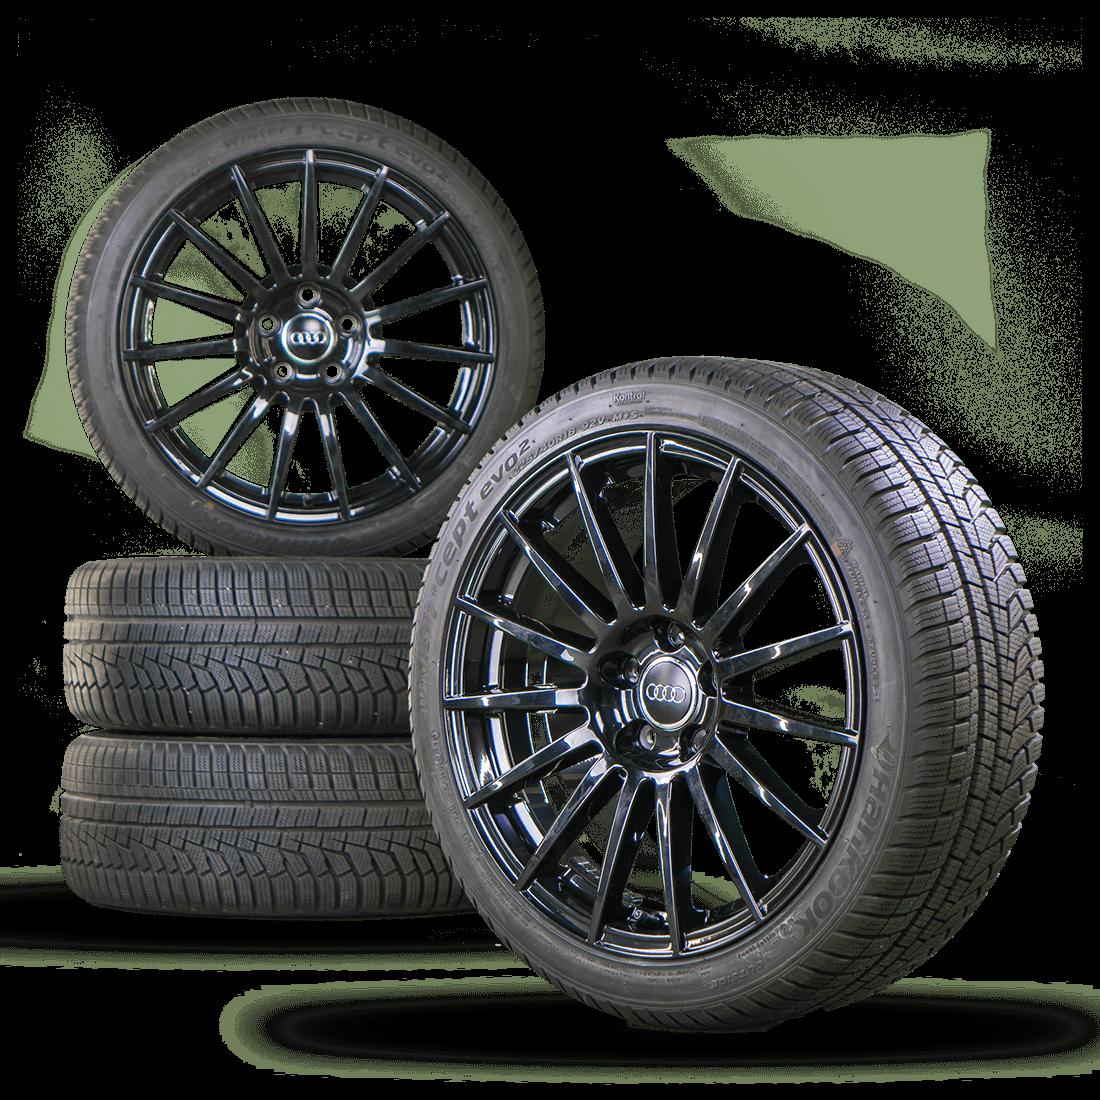 Audi 18 Inch A4 S4 8E Rims Winter Tires Winter Wheels Aluminum